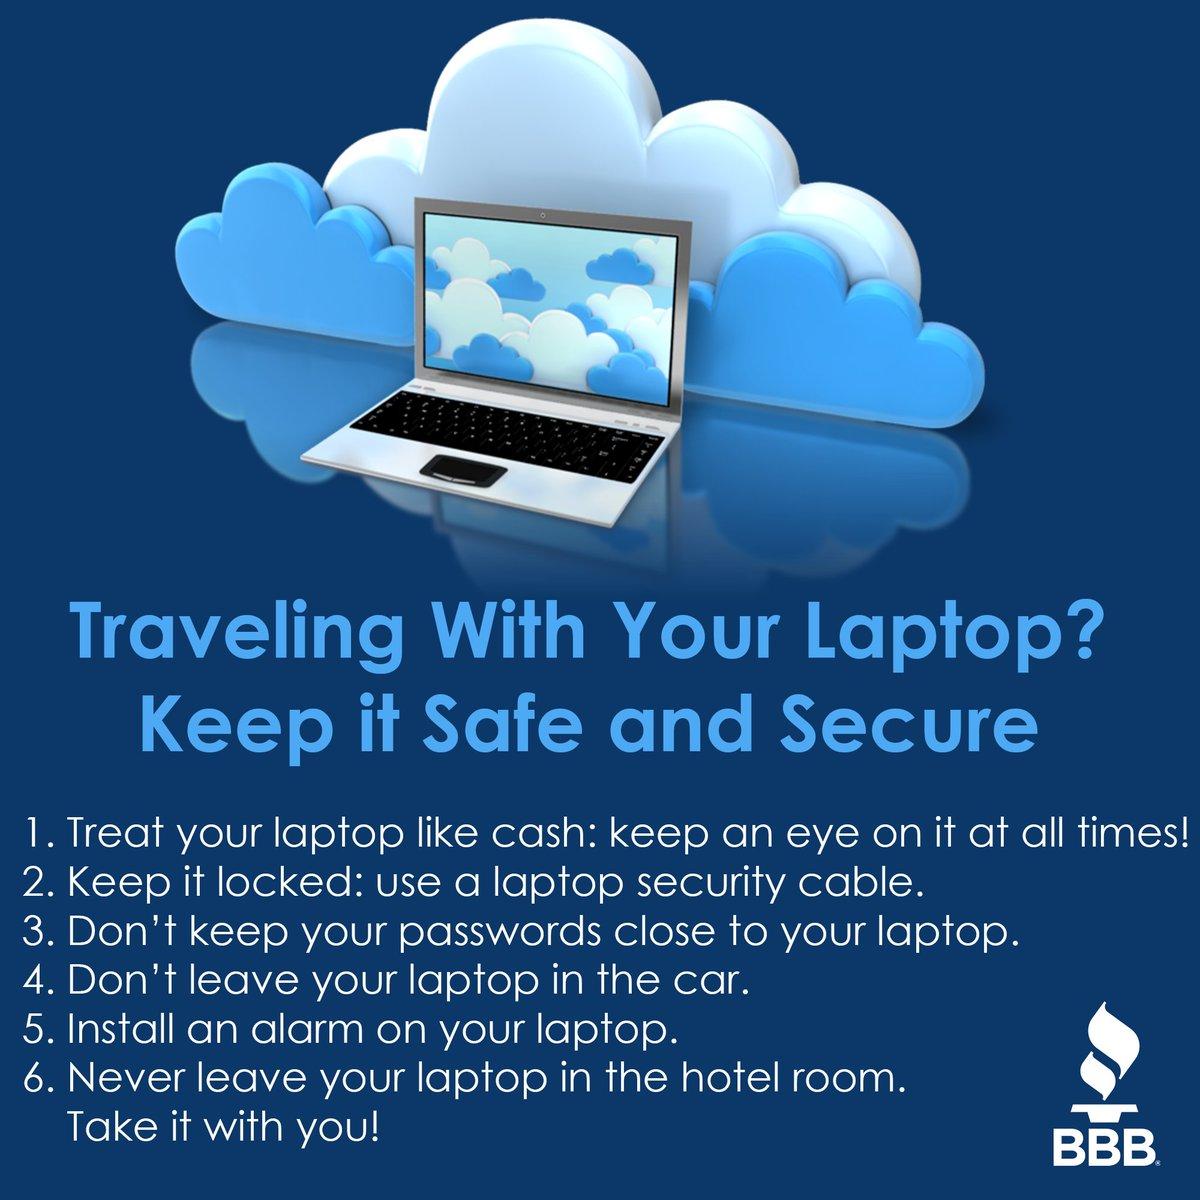 laptopsecurity hashtag on Twitter